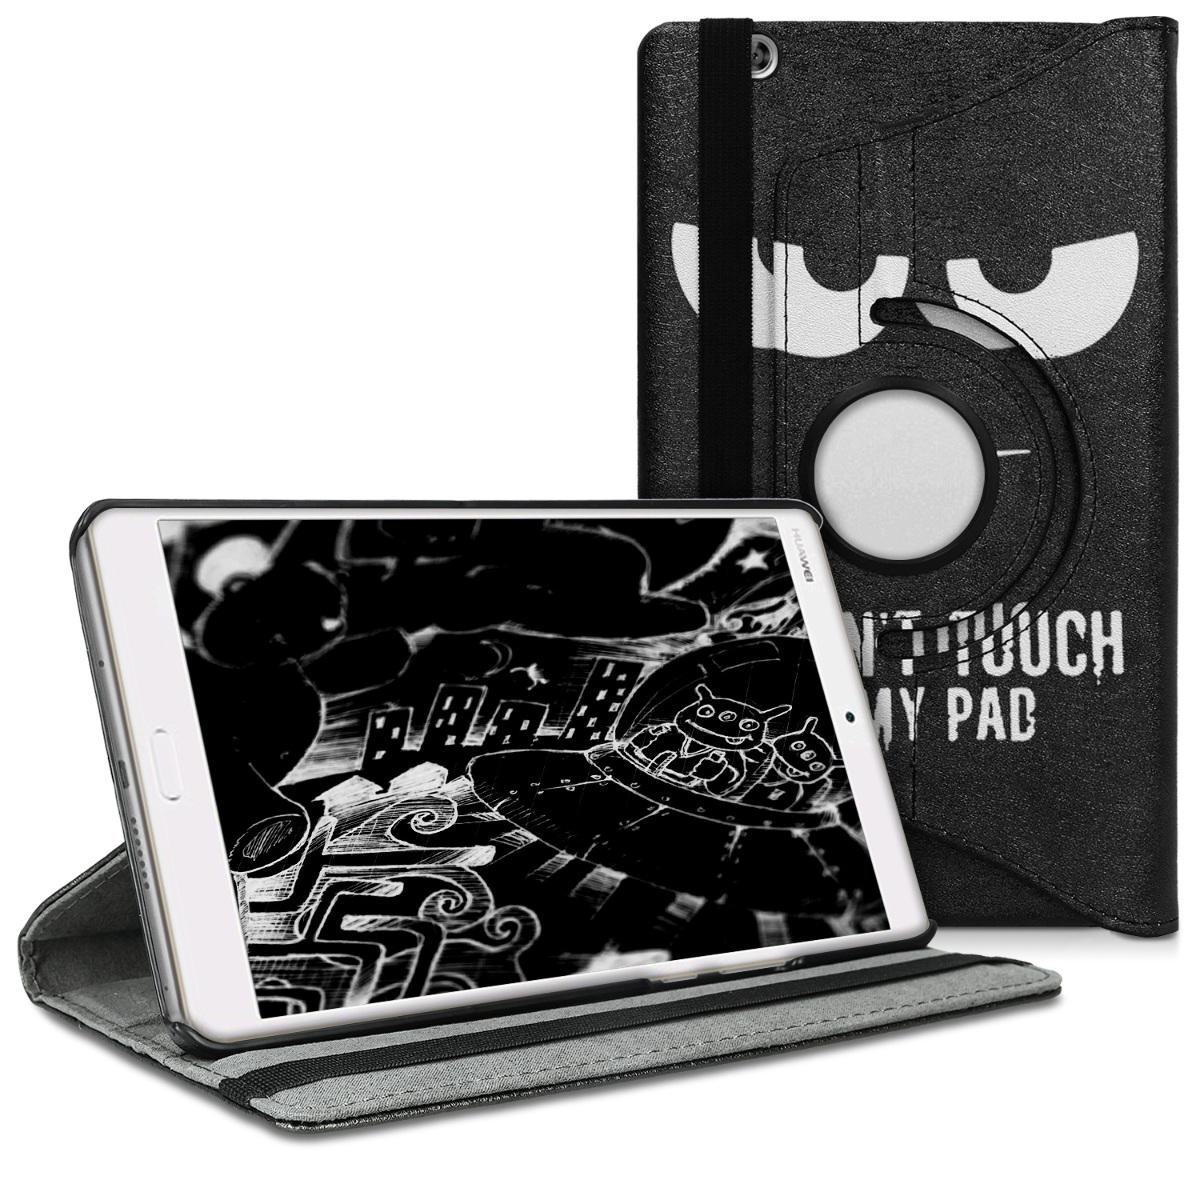 KW Θήκη 360° Huawei MediaPad M3 8.4 - Συνθετικό Δέρμα - White / Black (45343.01)